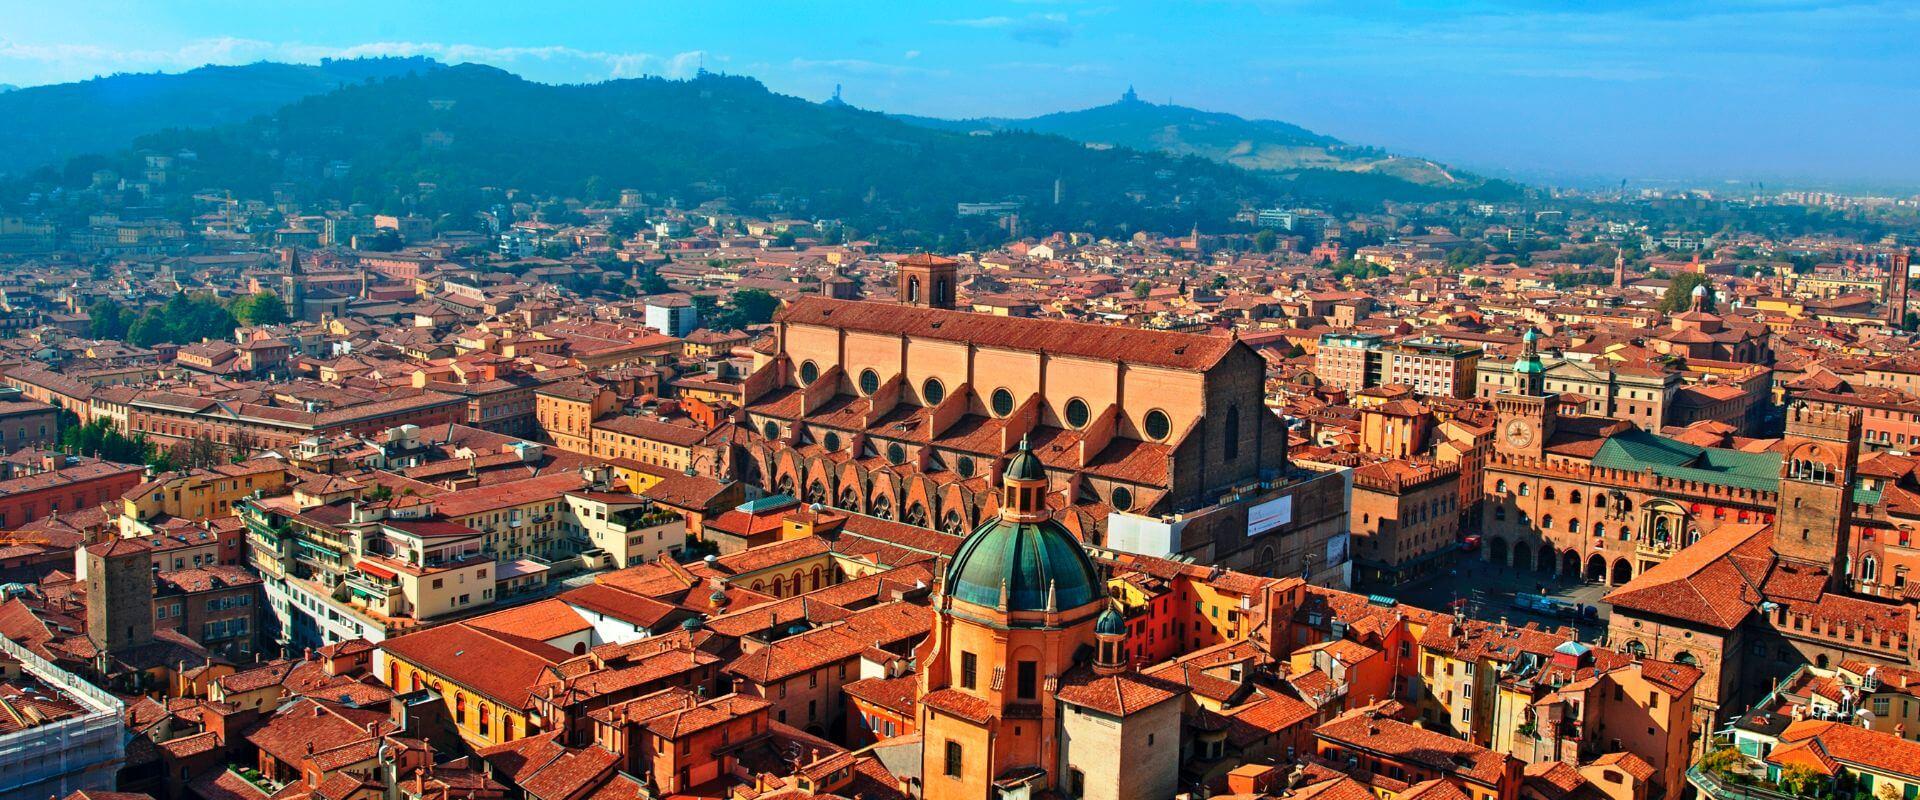 Städtereise nach Bologna